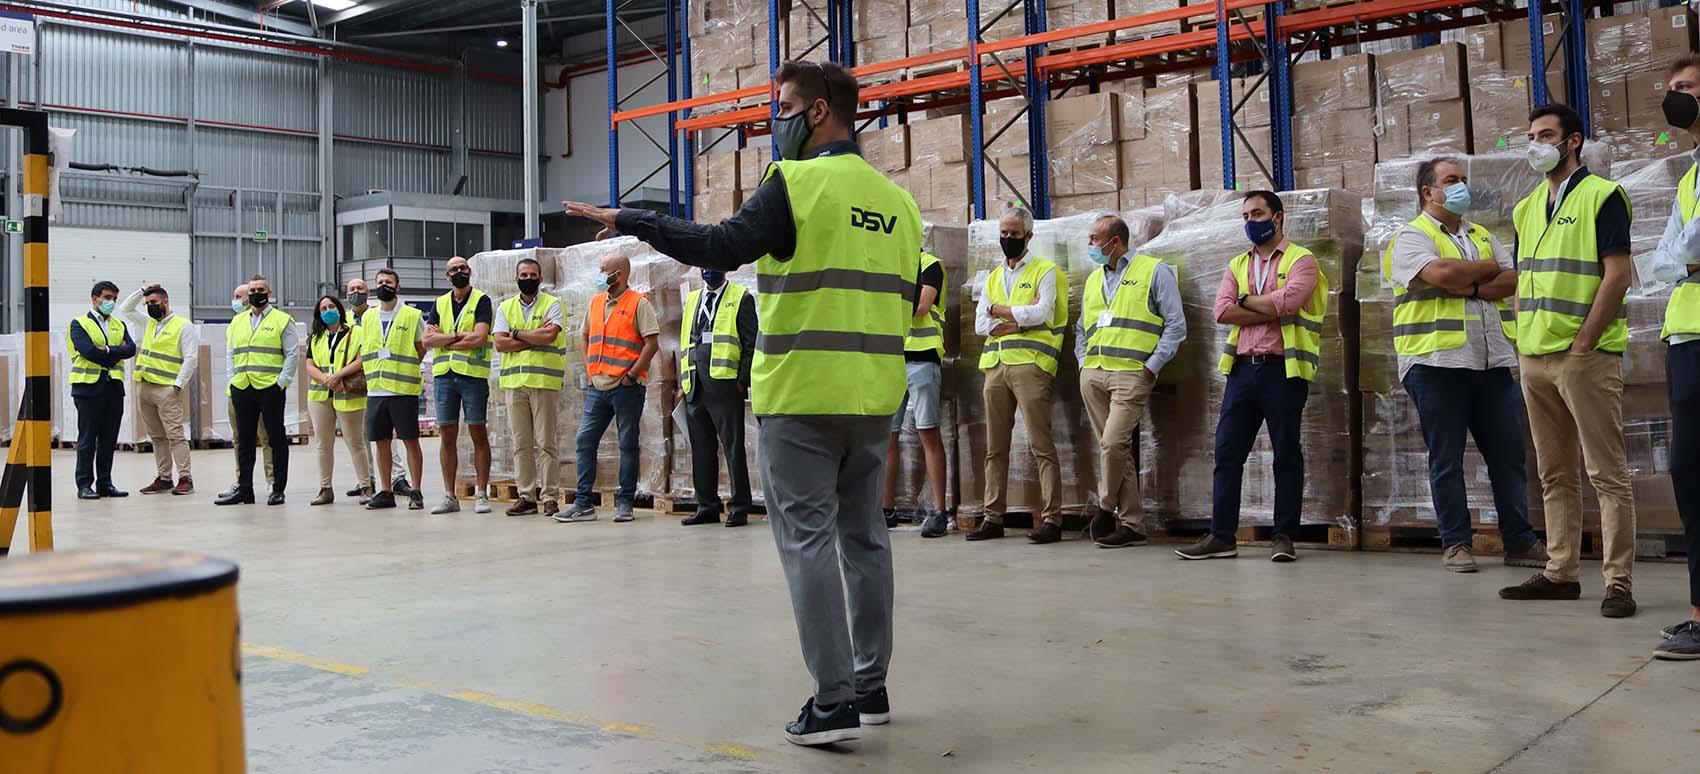 ithink logistics day dsv logismoto rubi